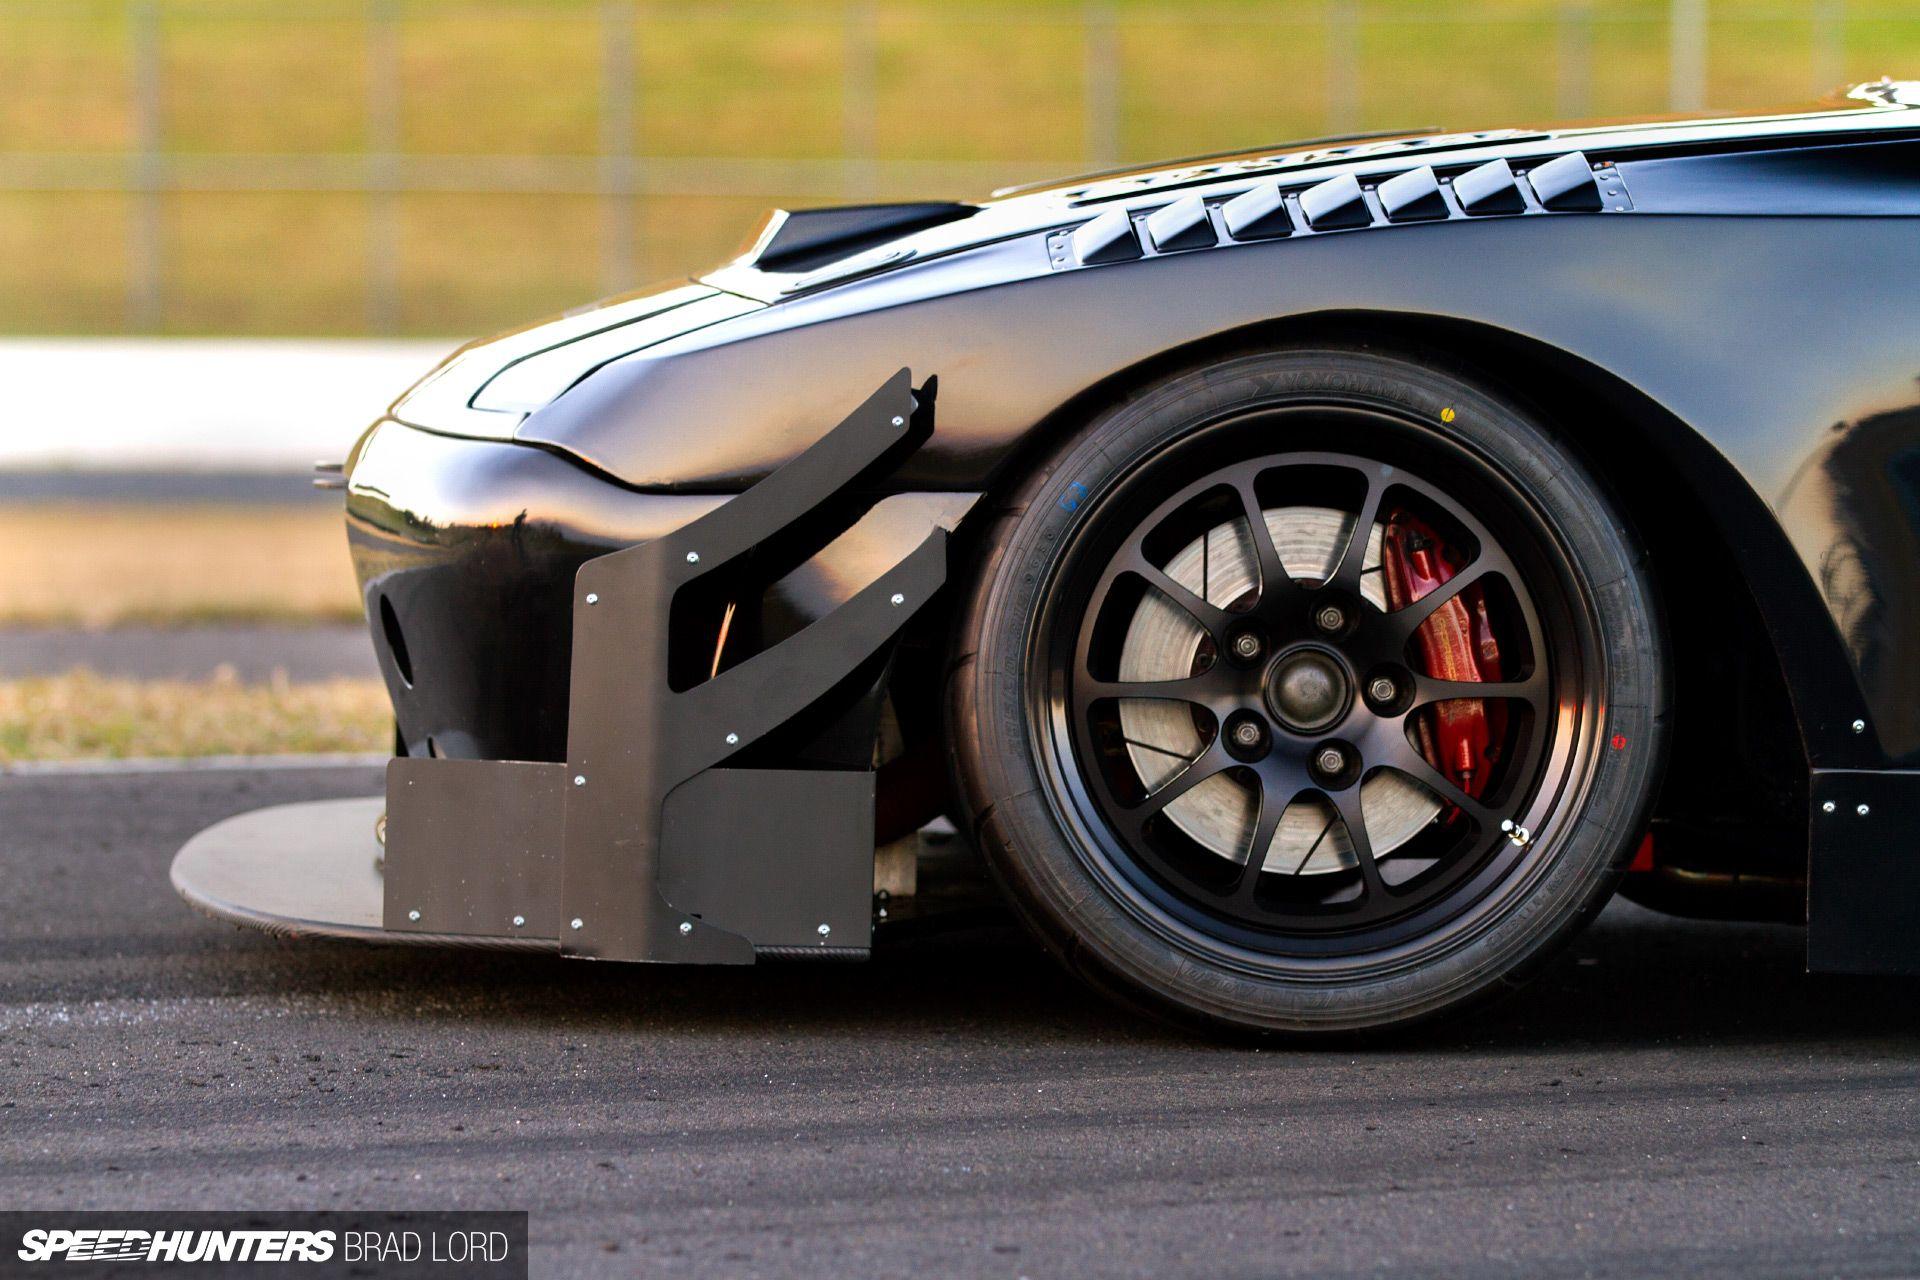 Time Attack Front End Aero Splitter Racecar Ideas